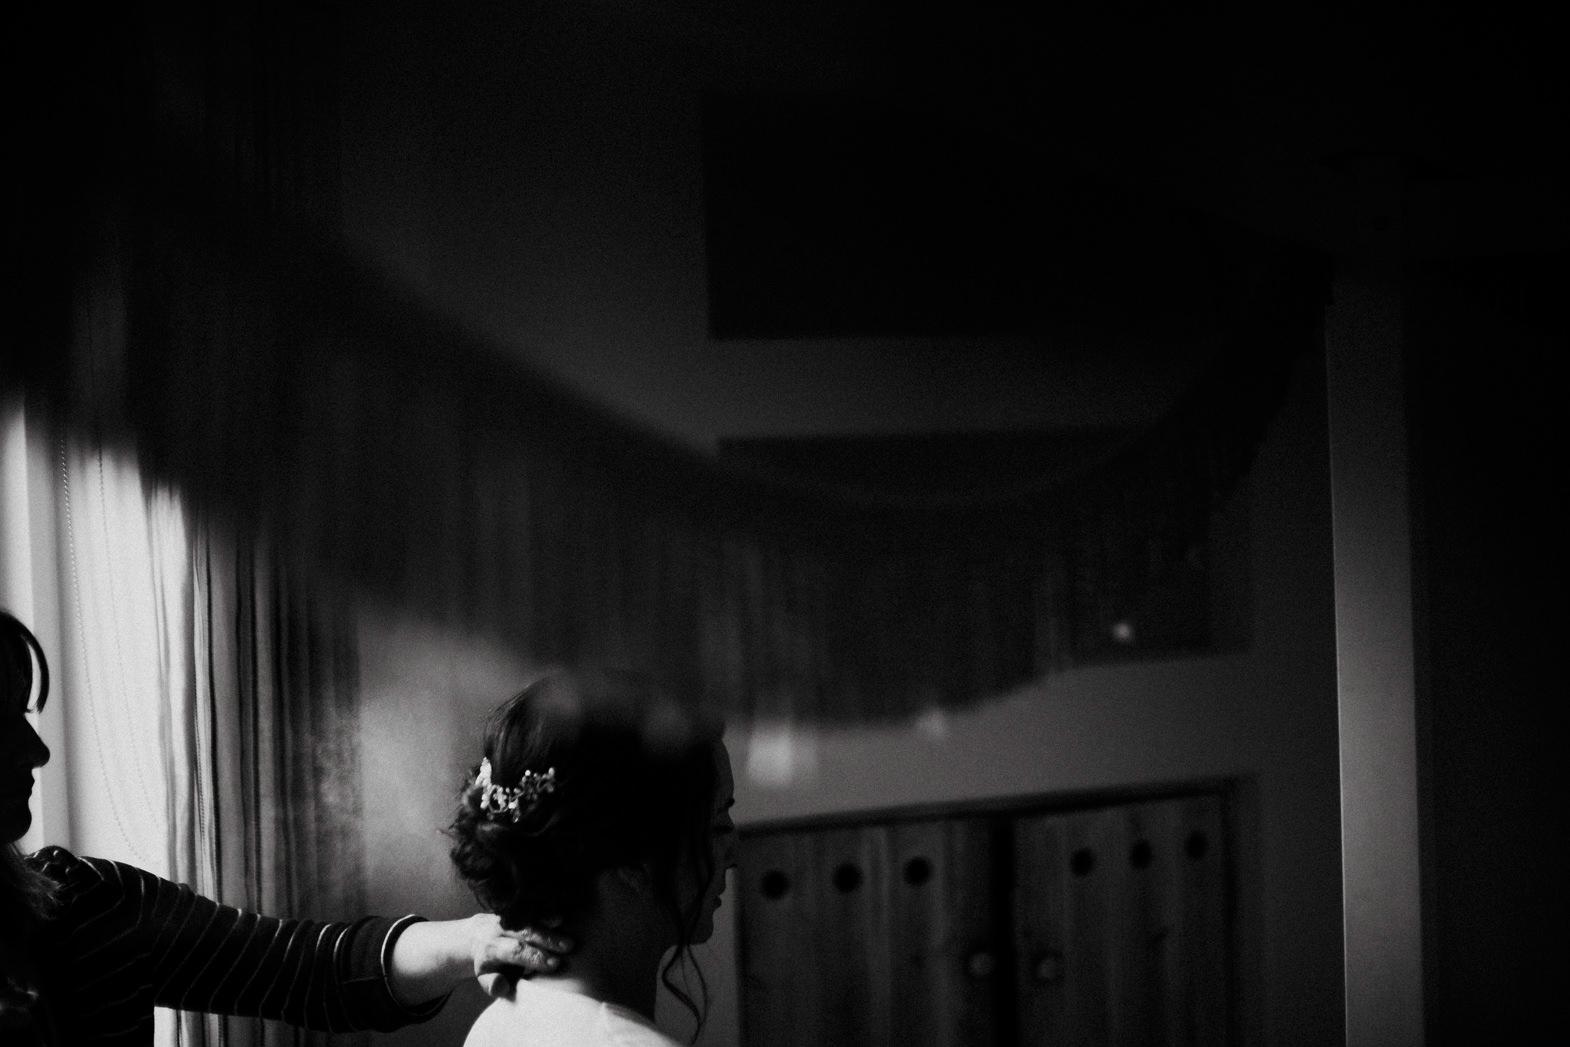 WEDDING PHOTOGRAPHy AT LOWER BARN (2).jpg